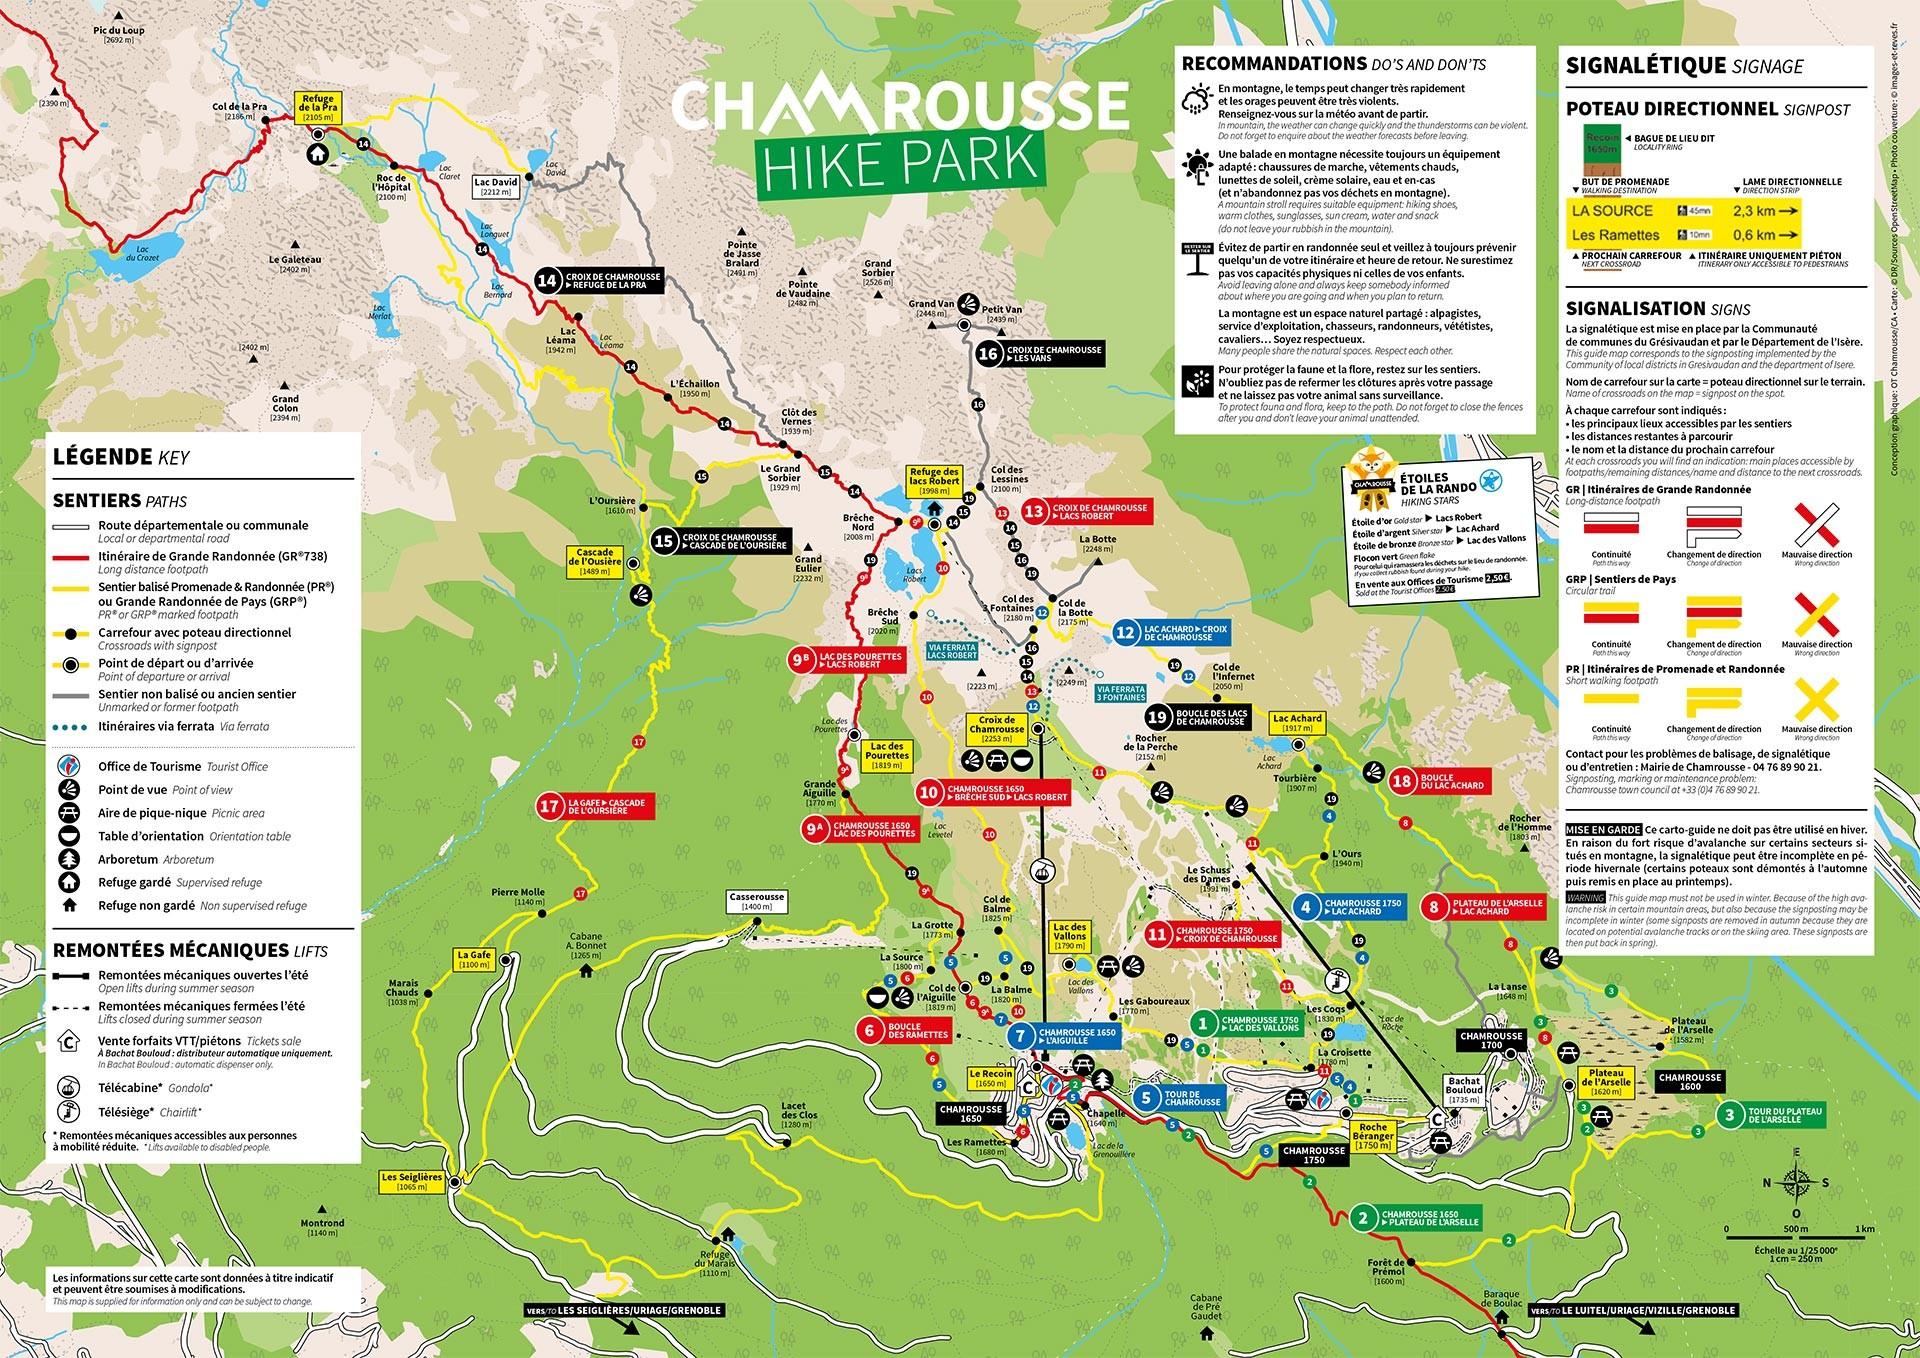 Chamrousse plan randonnée balade rando été station montagne grenoble isère alpes france